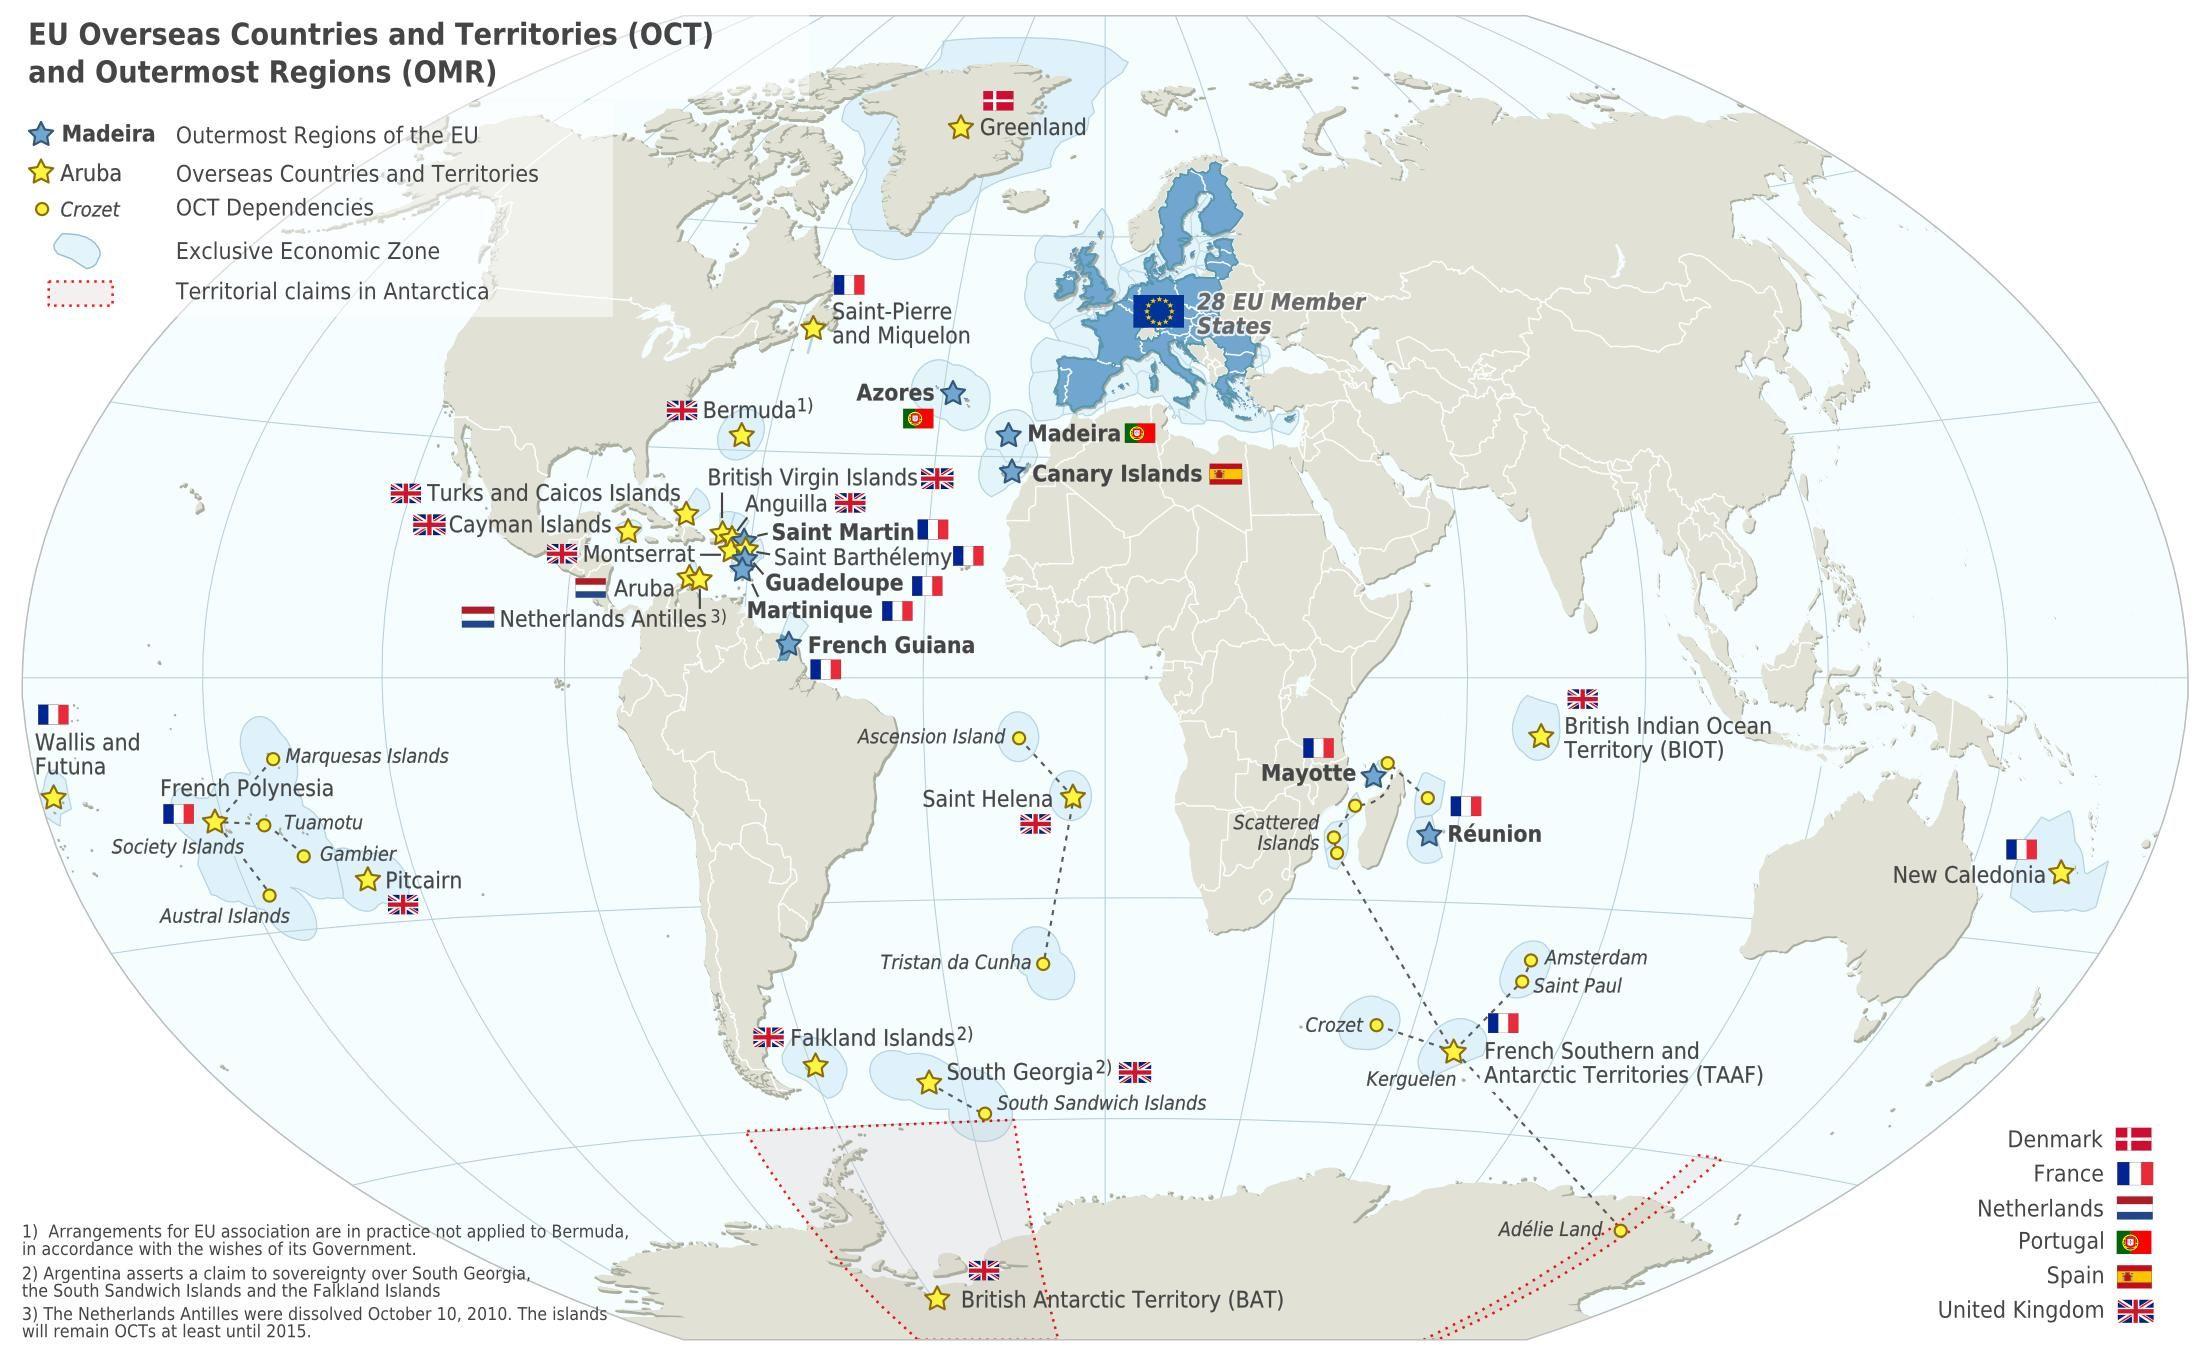 Eu overseas countries and territories map eu europe maps eu overseas countries and territories map eu europe gumiabroncs Images